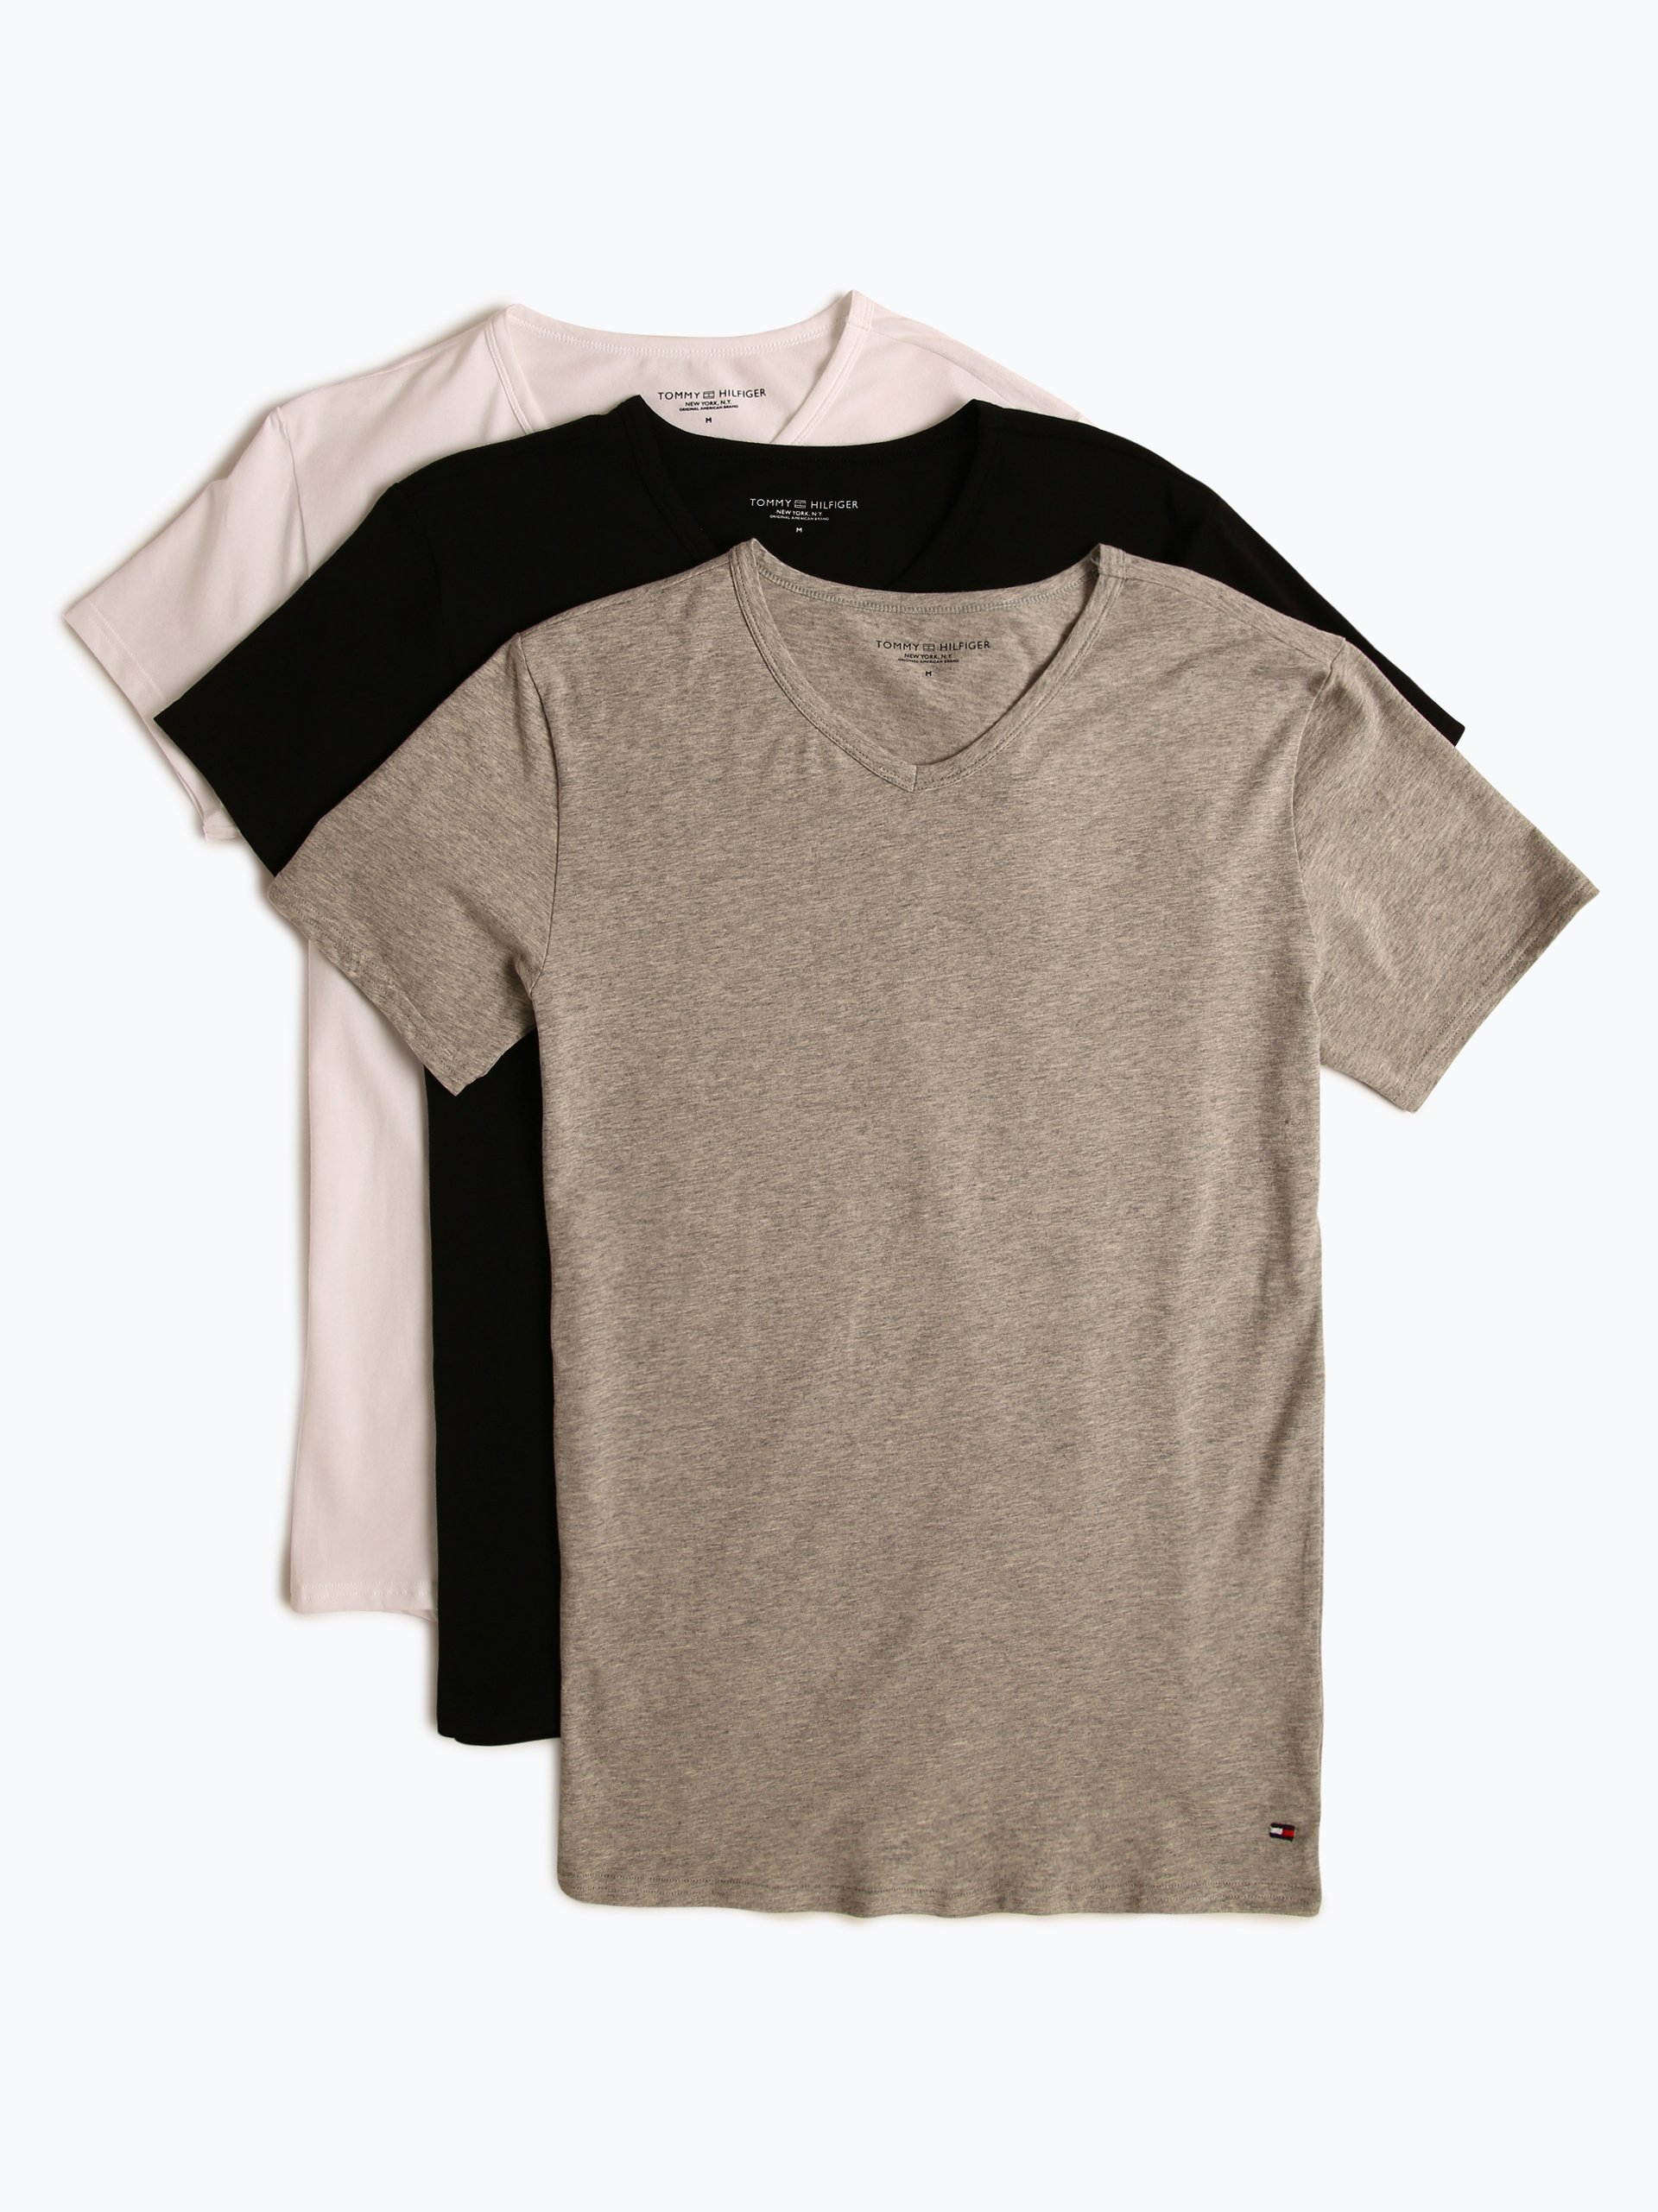 Tommy Hilfiger Herren T-Shirt im 3er-Pack